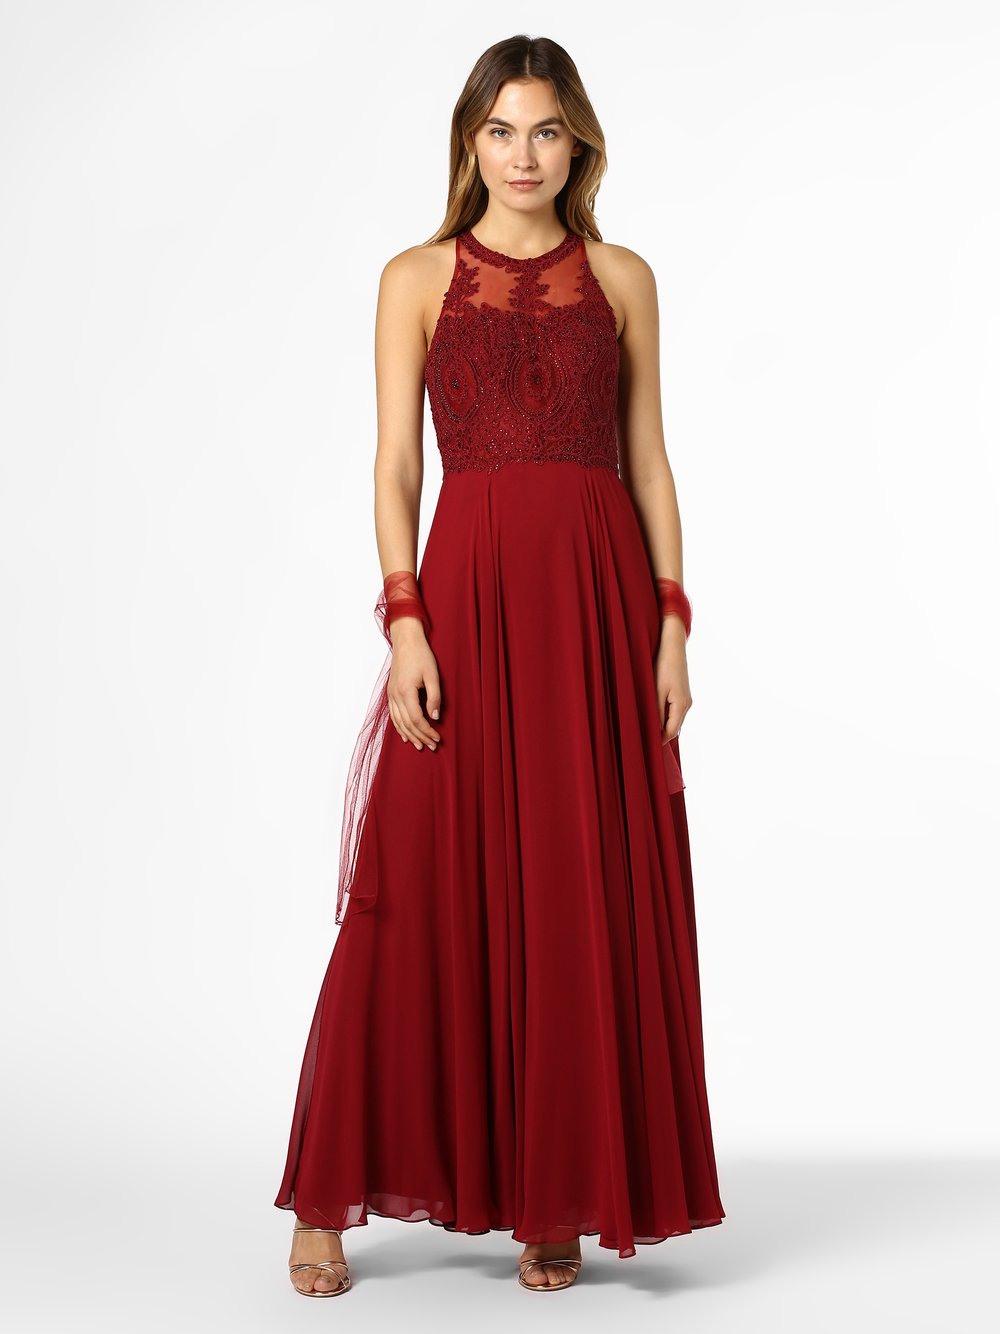 17 Cool Damen Abendkleid Ärmel Elegant Damen Abendkleid Galerie